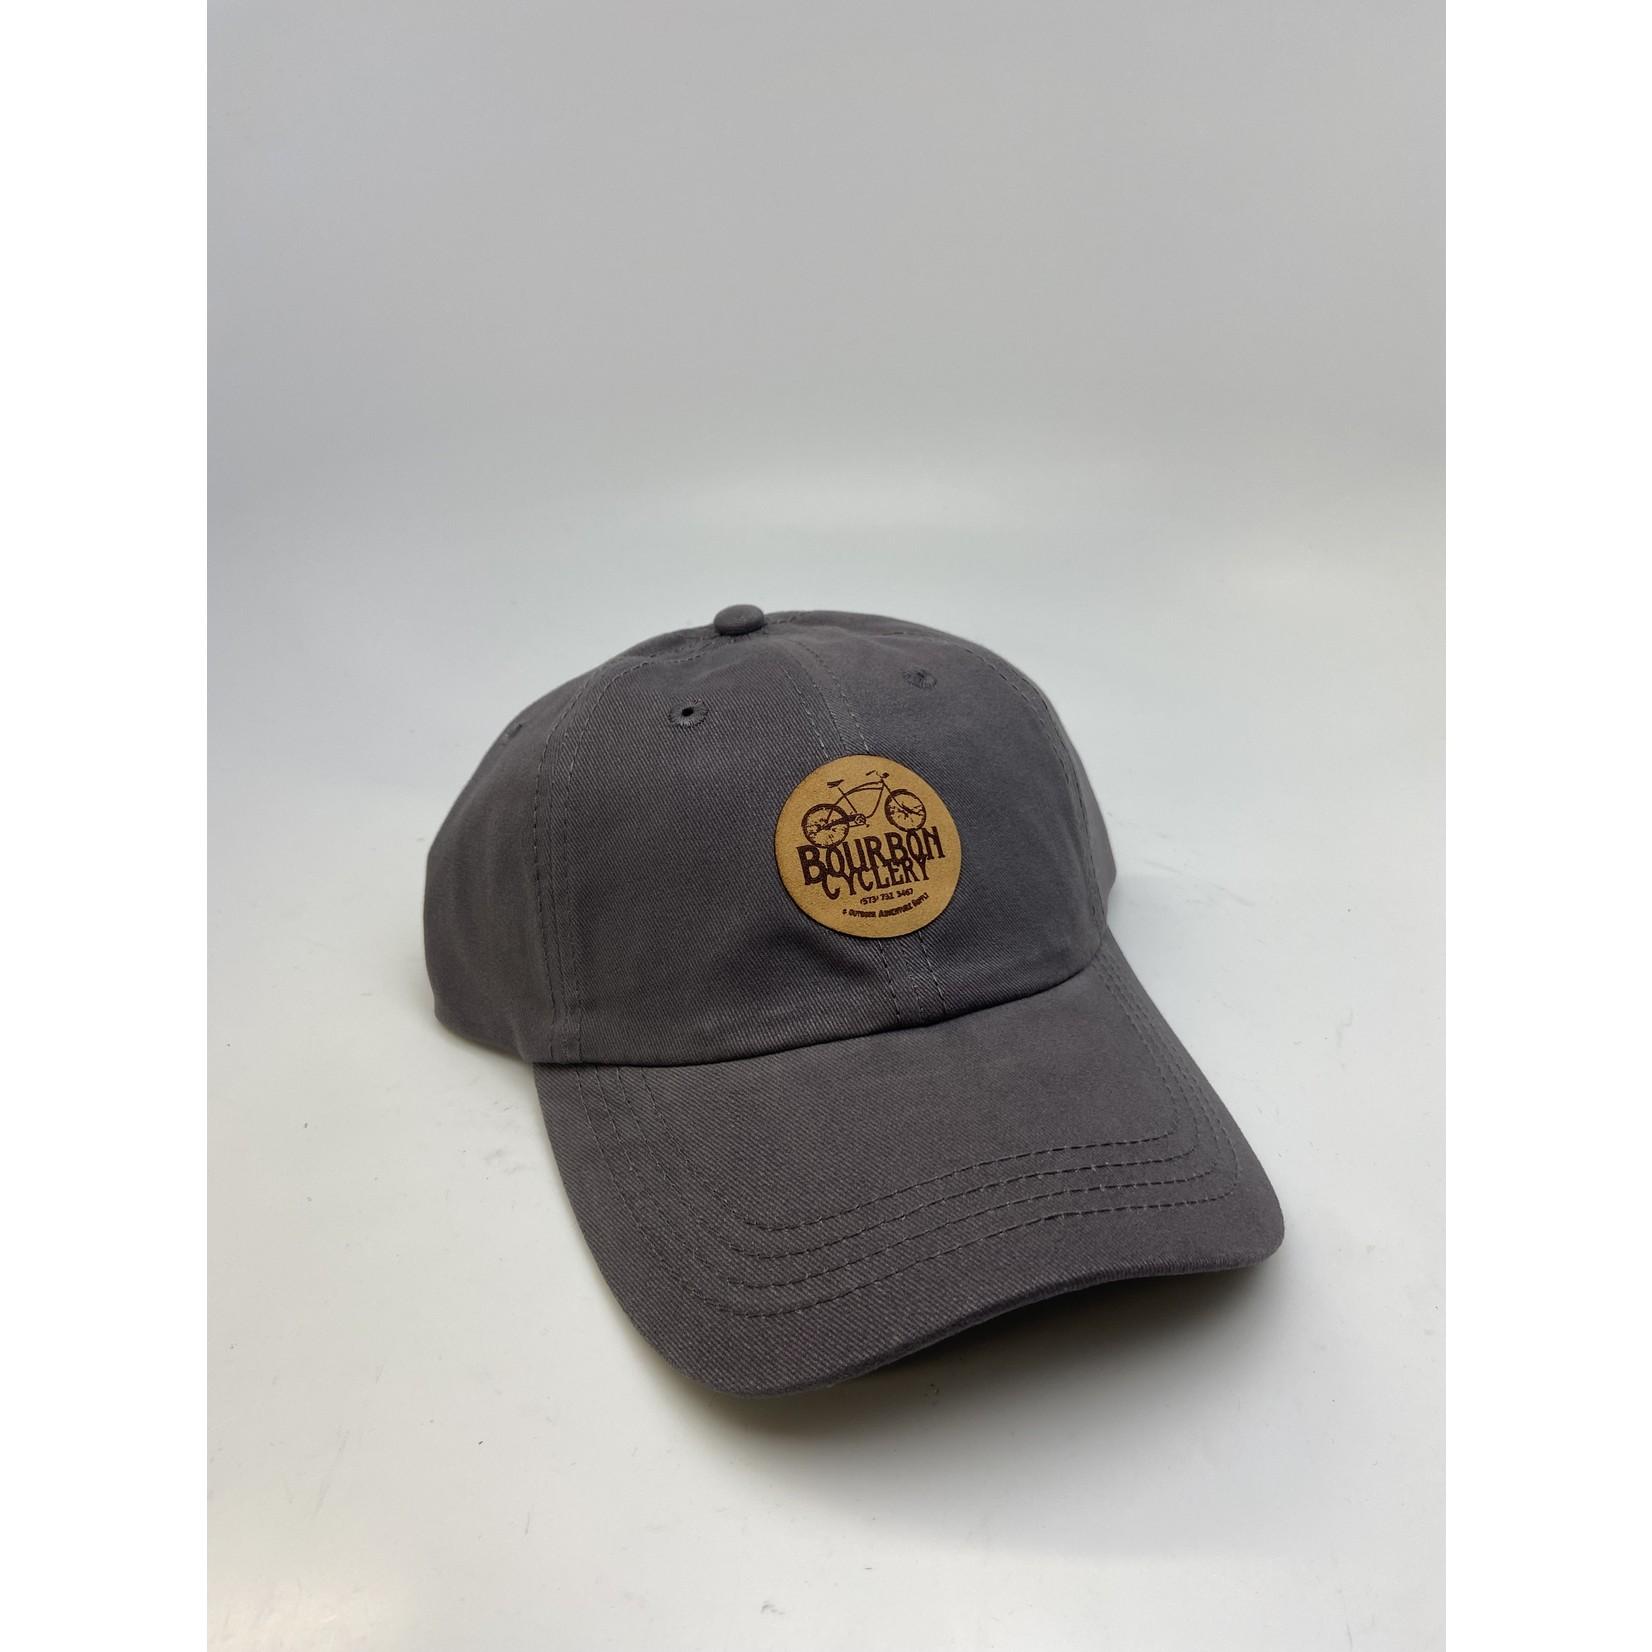 Bourbon Cyclery Bourbon Cyclery Ball Cap / Hat